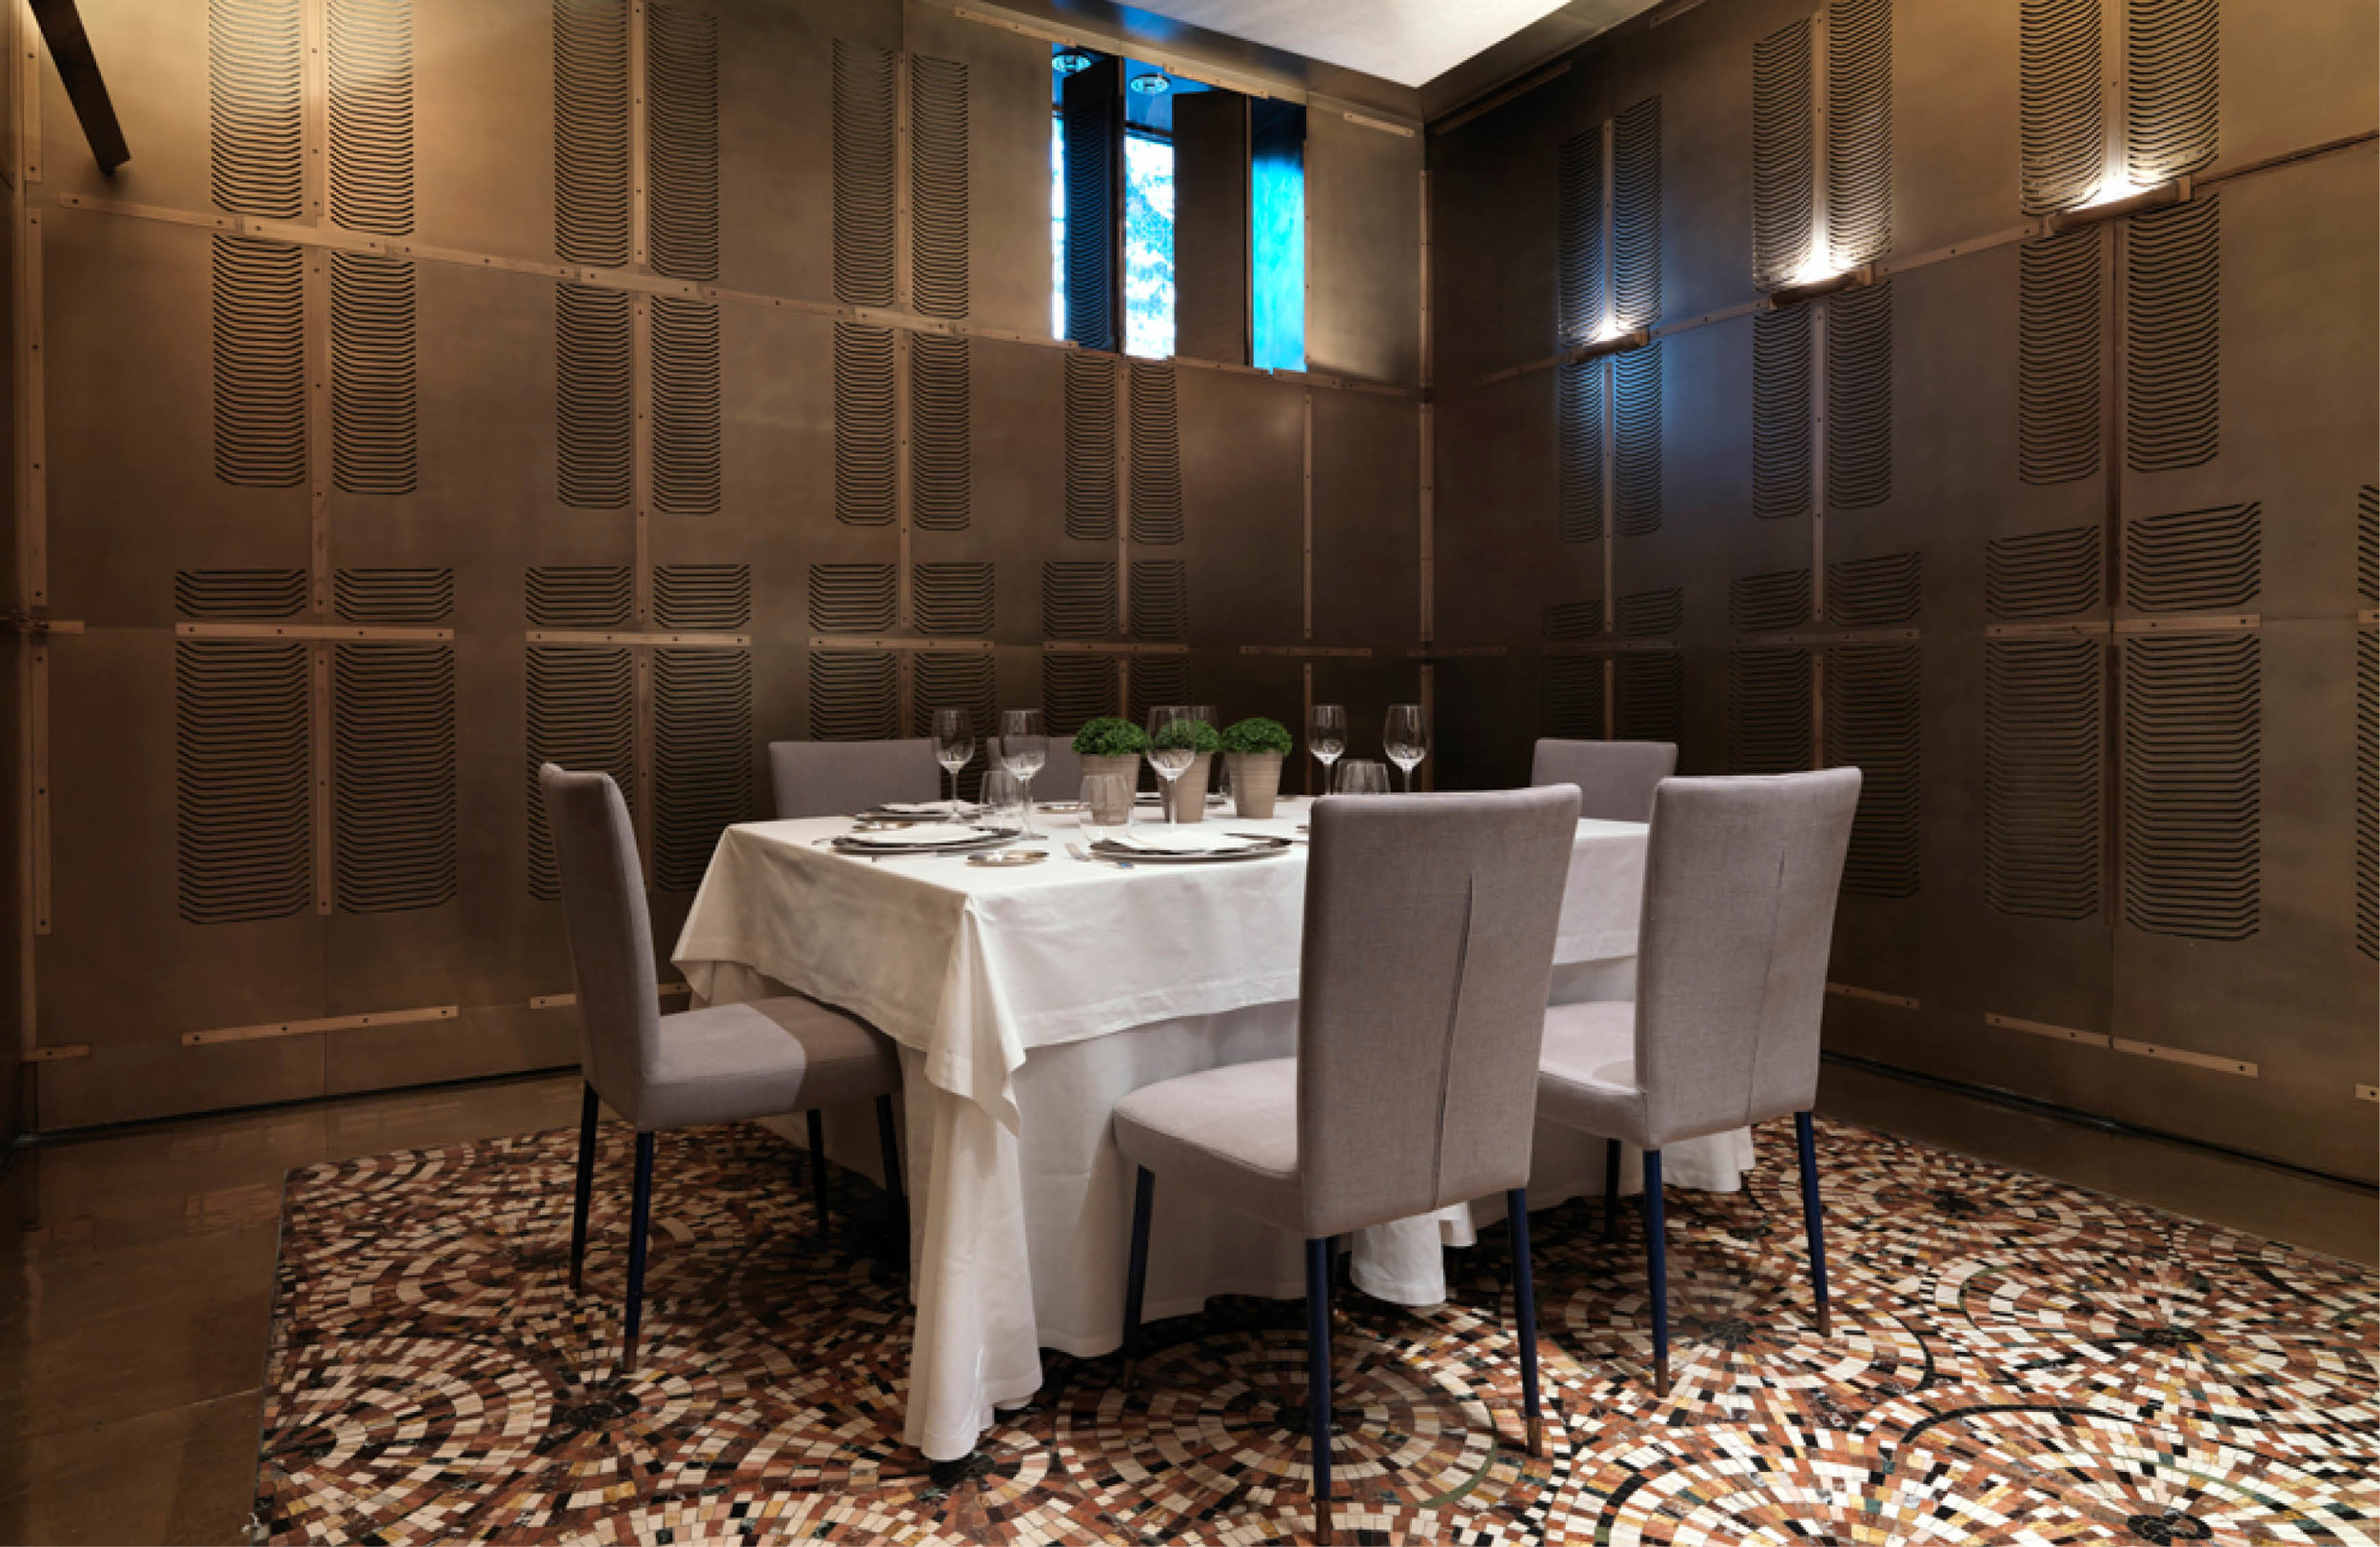 Merces-one-restaurante-una-sola-mesa-2